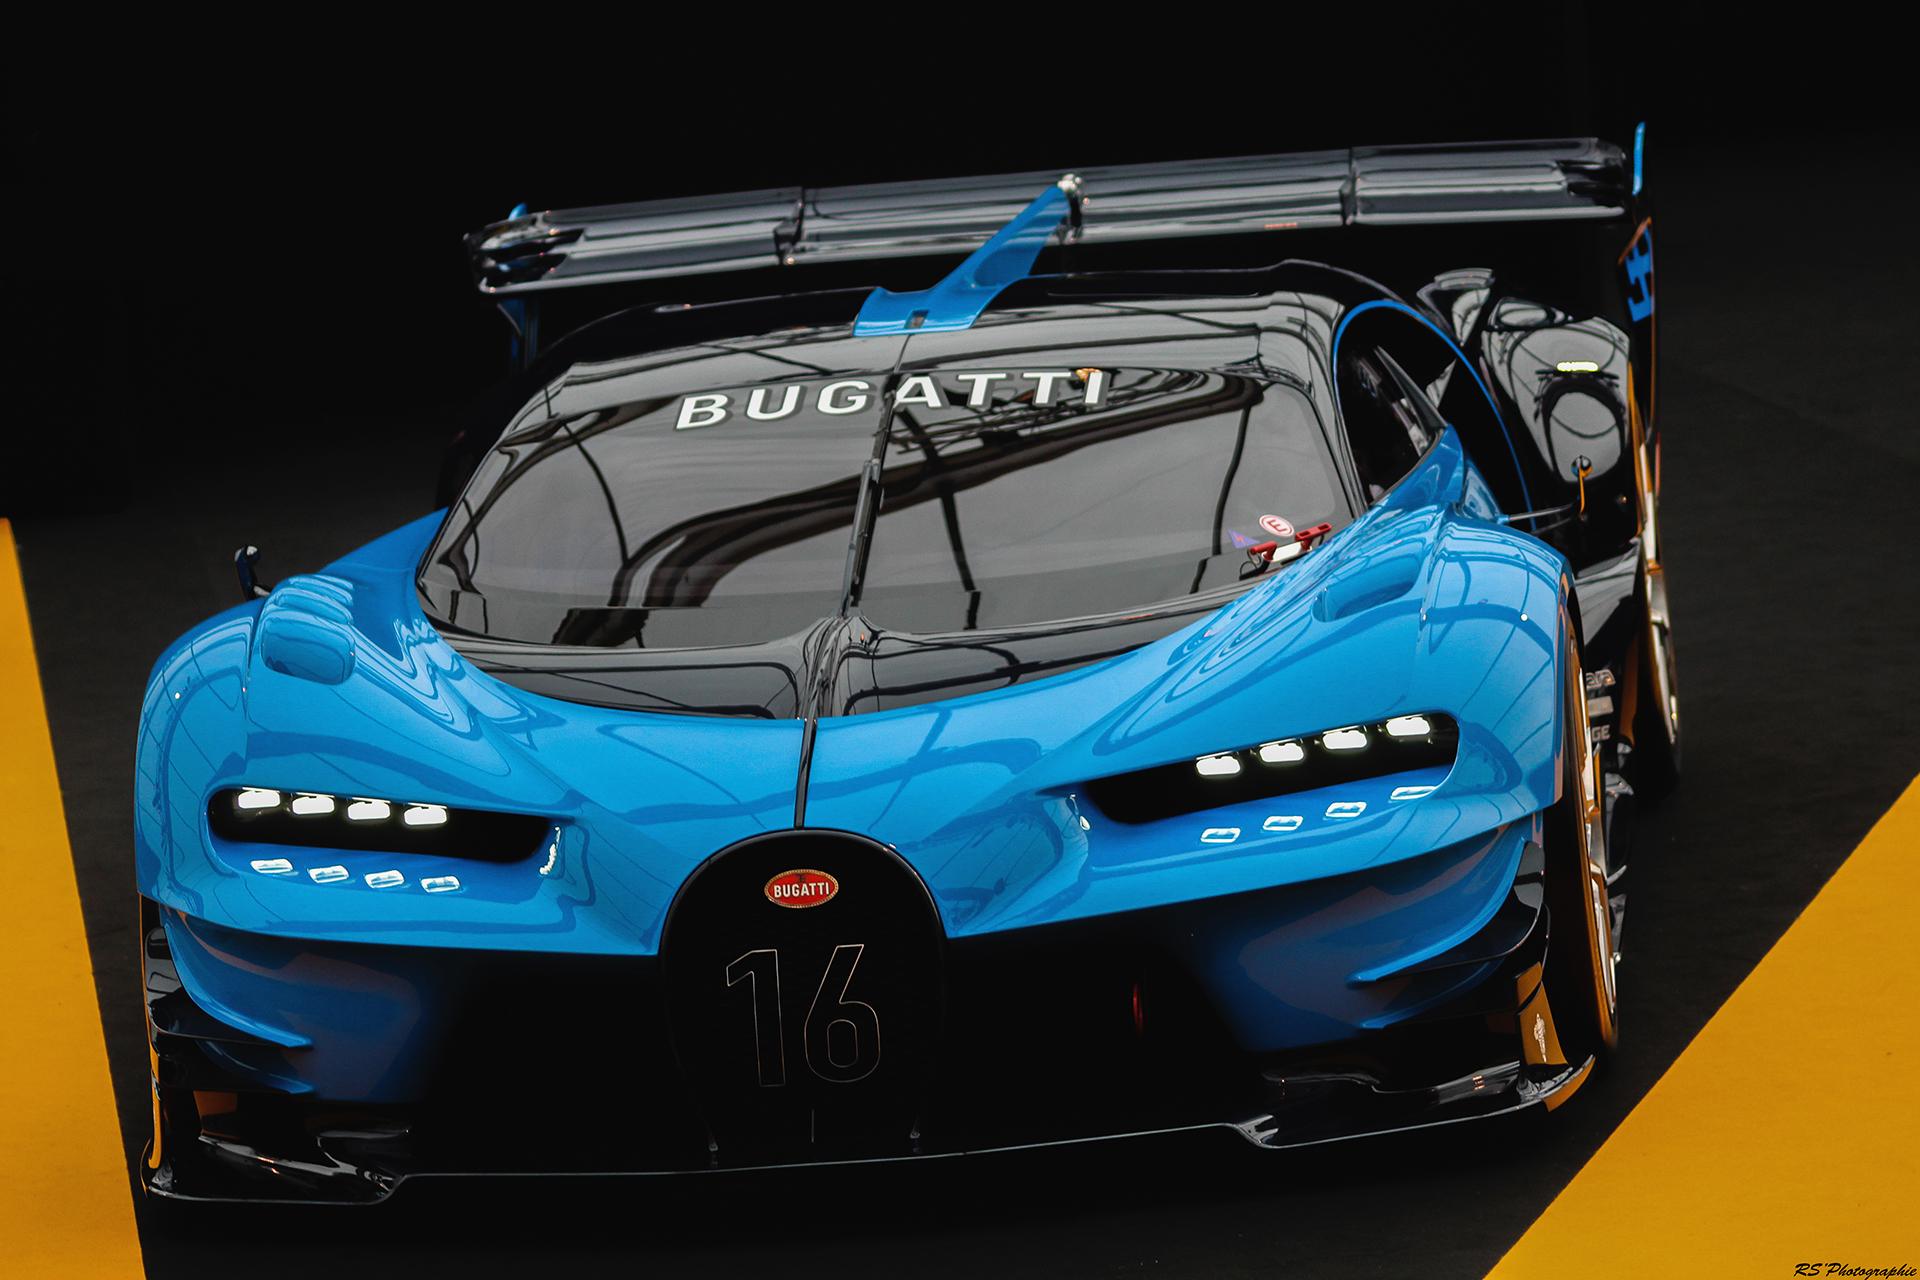 Bugatti Vision Gran Turismo - Exposition Concept cars 2016 - Arnaud Demasier RS Photographie